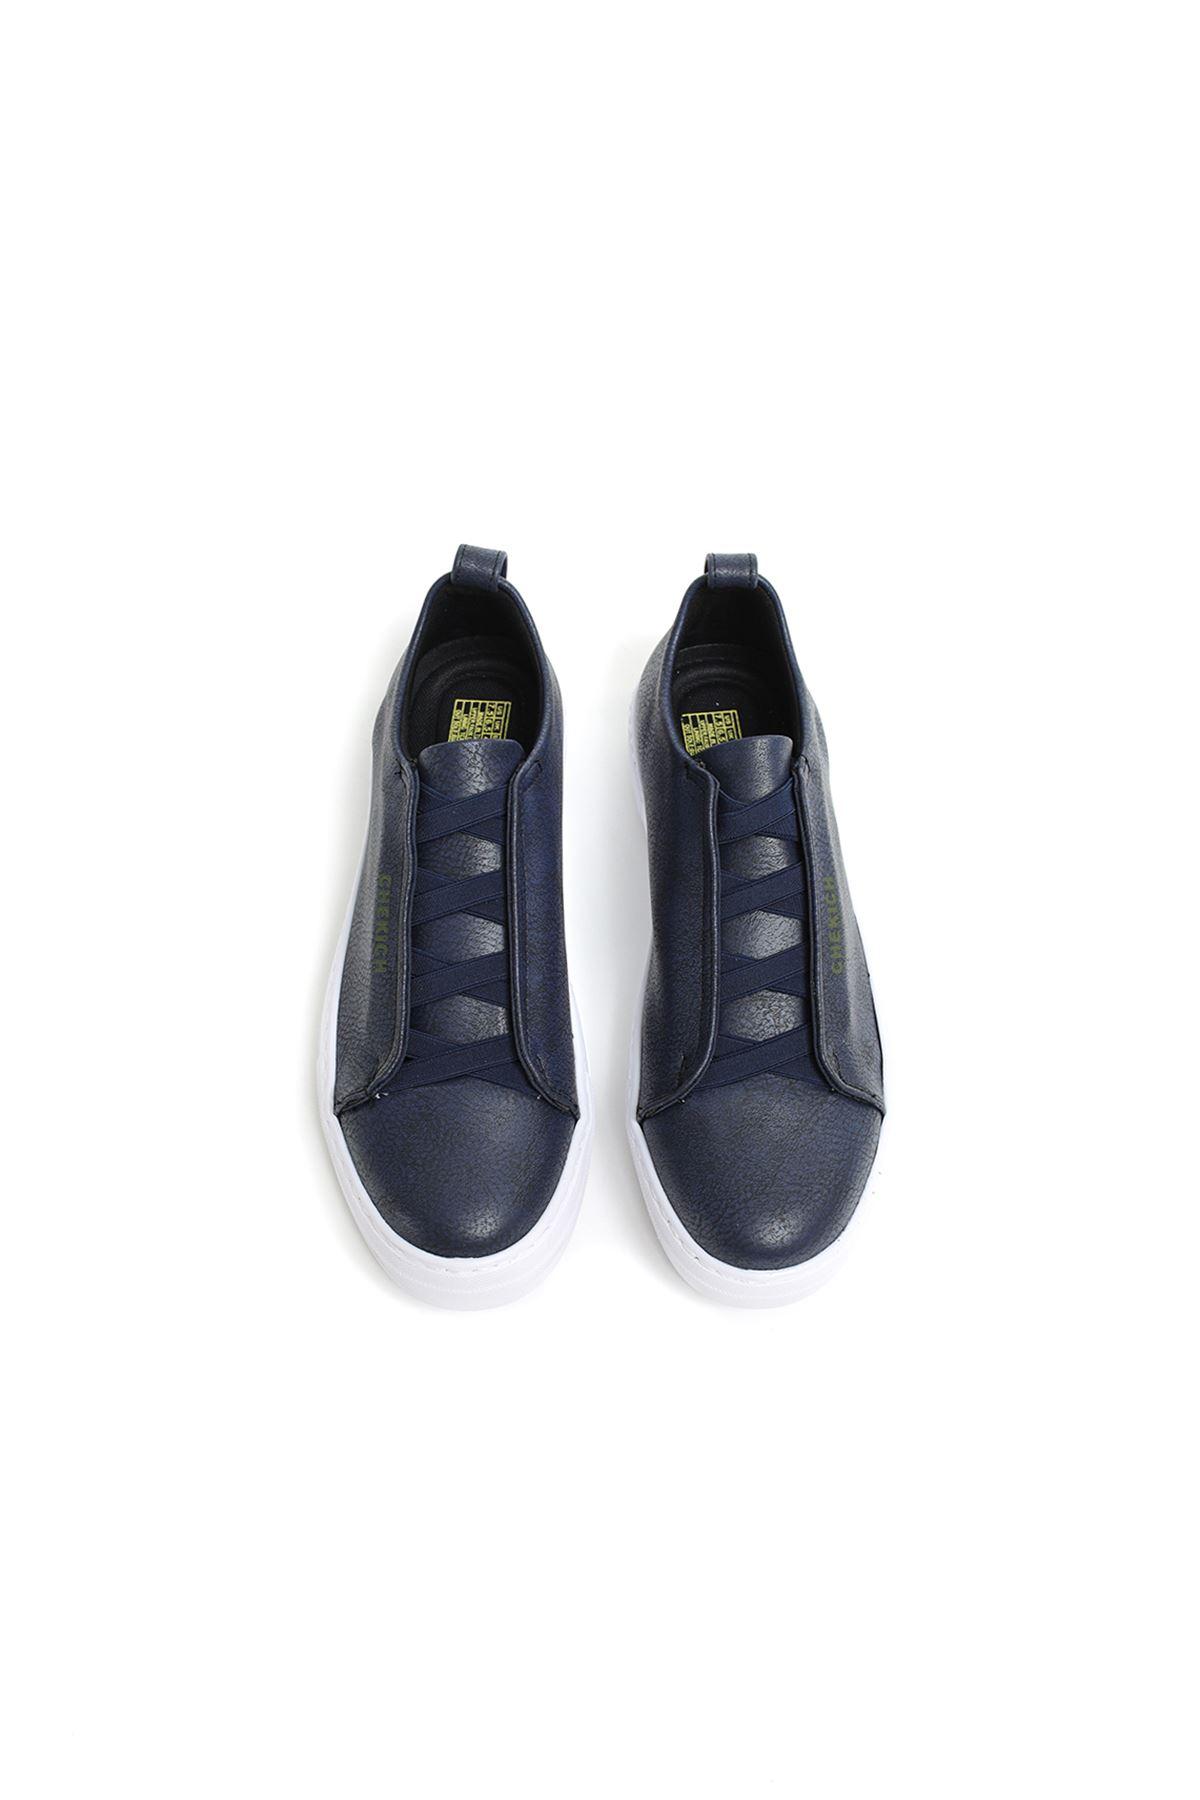 Chekich CH013 BT Erkek Ayakkabı LACIVERT